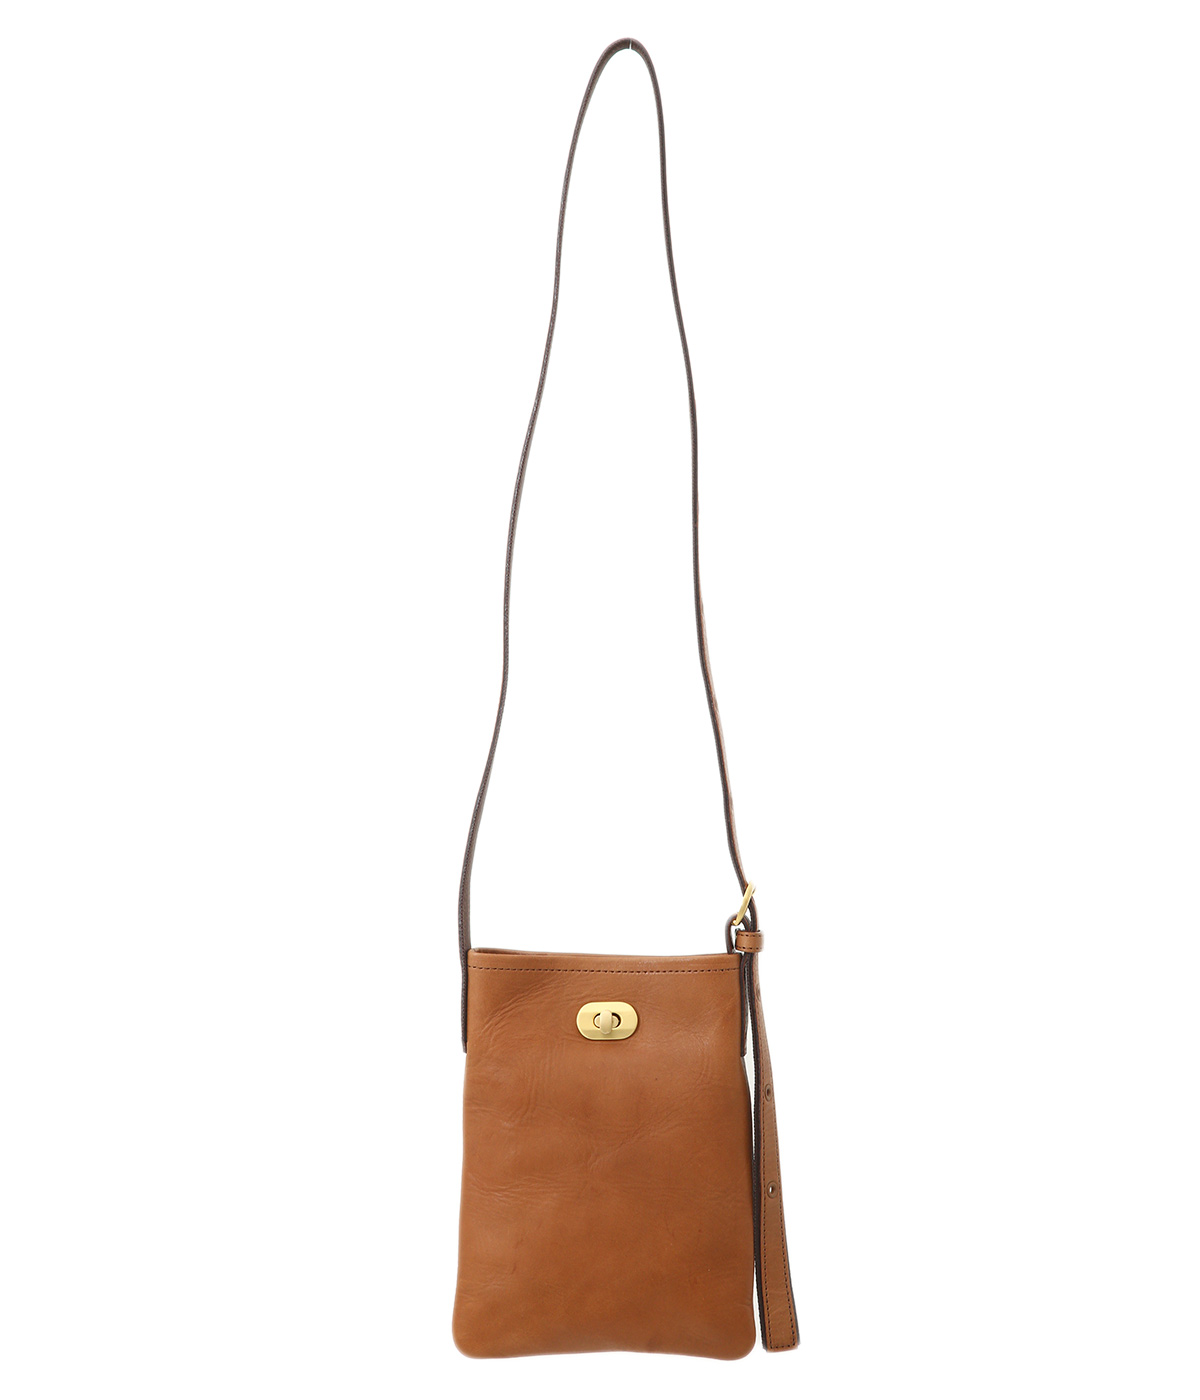 twist buckle bag XS